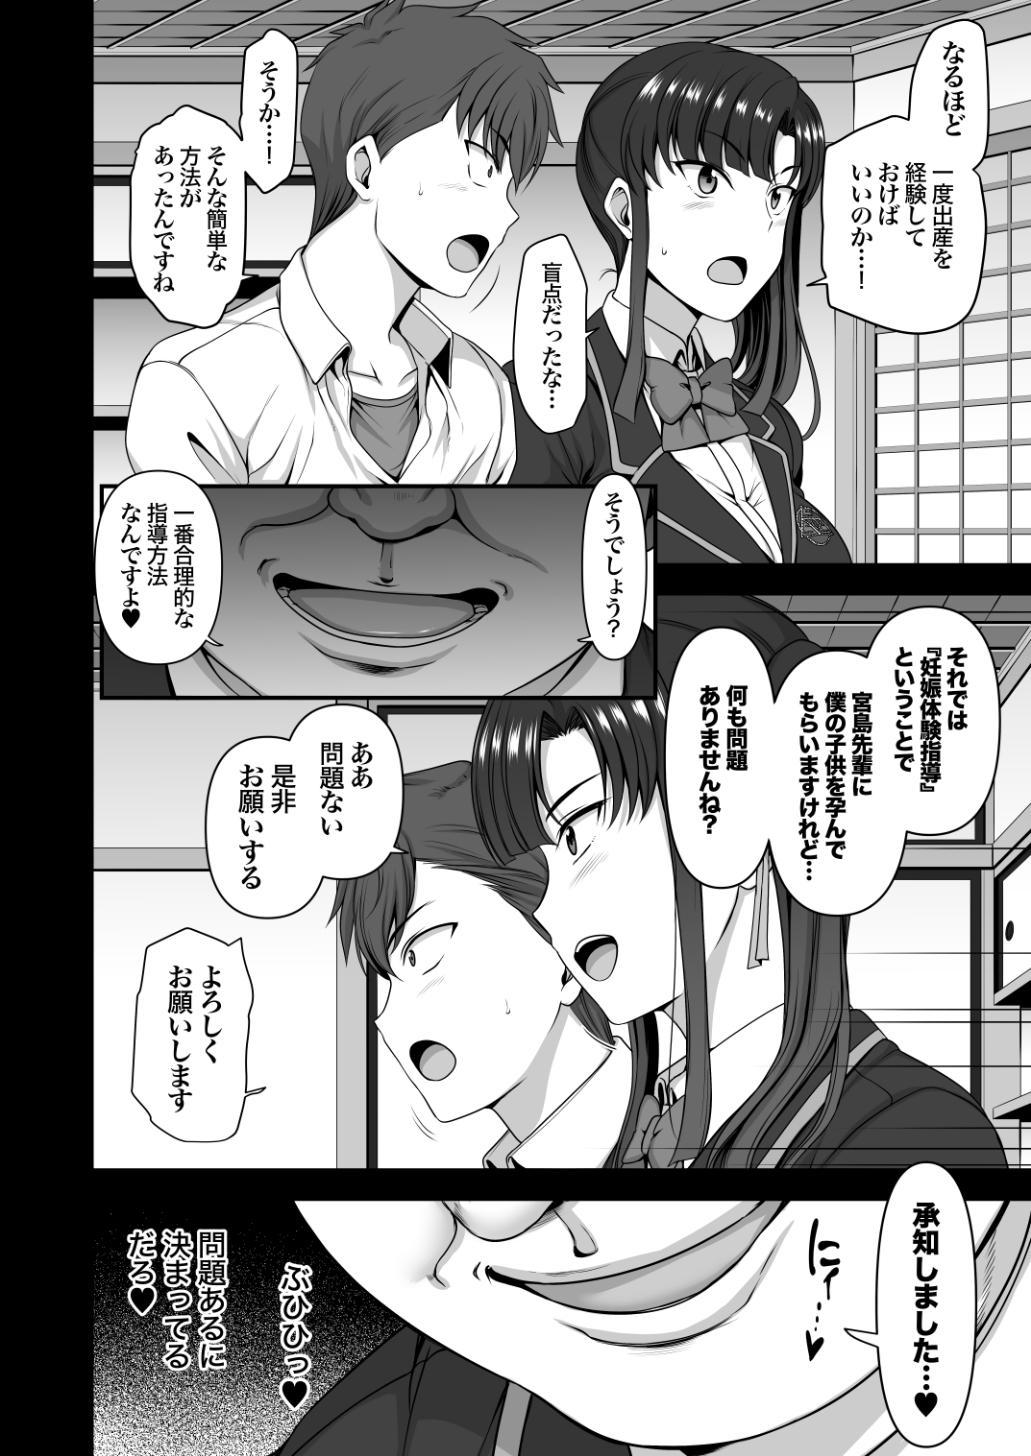 Saimin Seishidou Soushuuhen 1 148